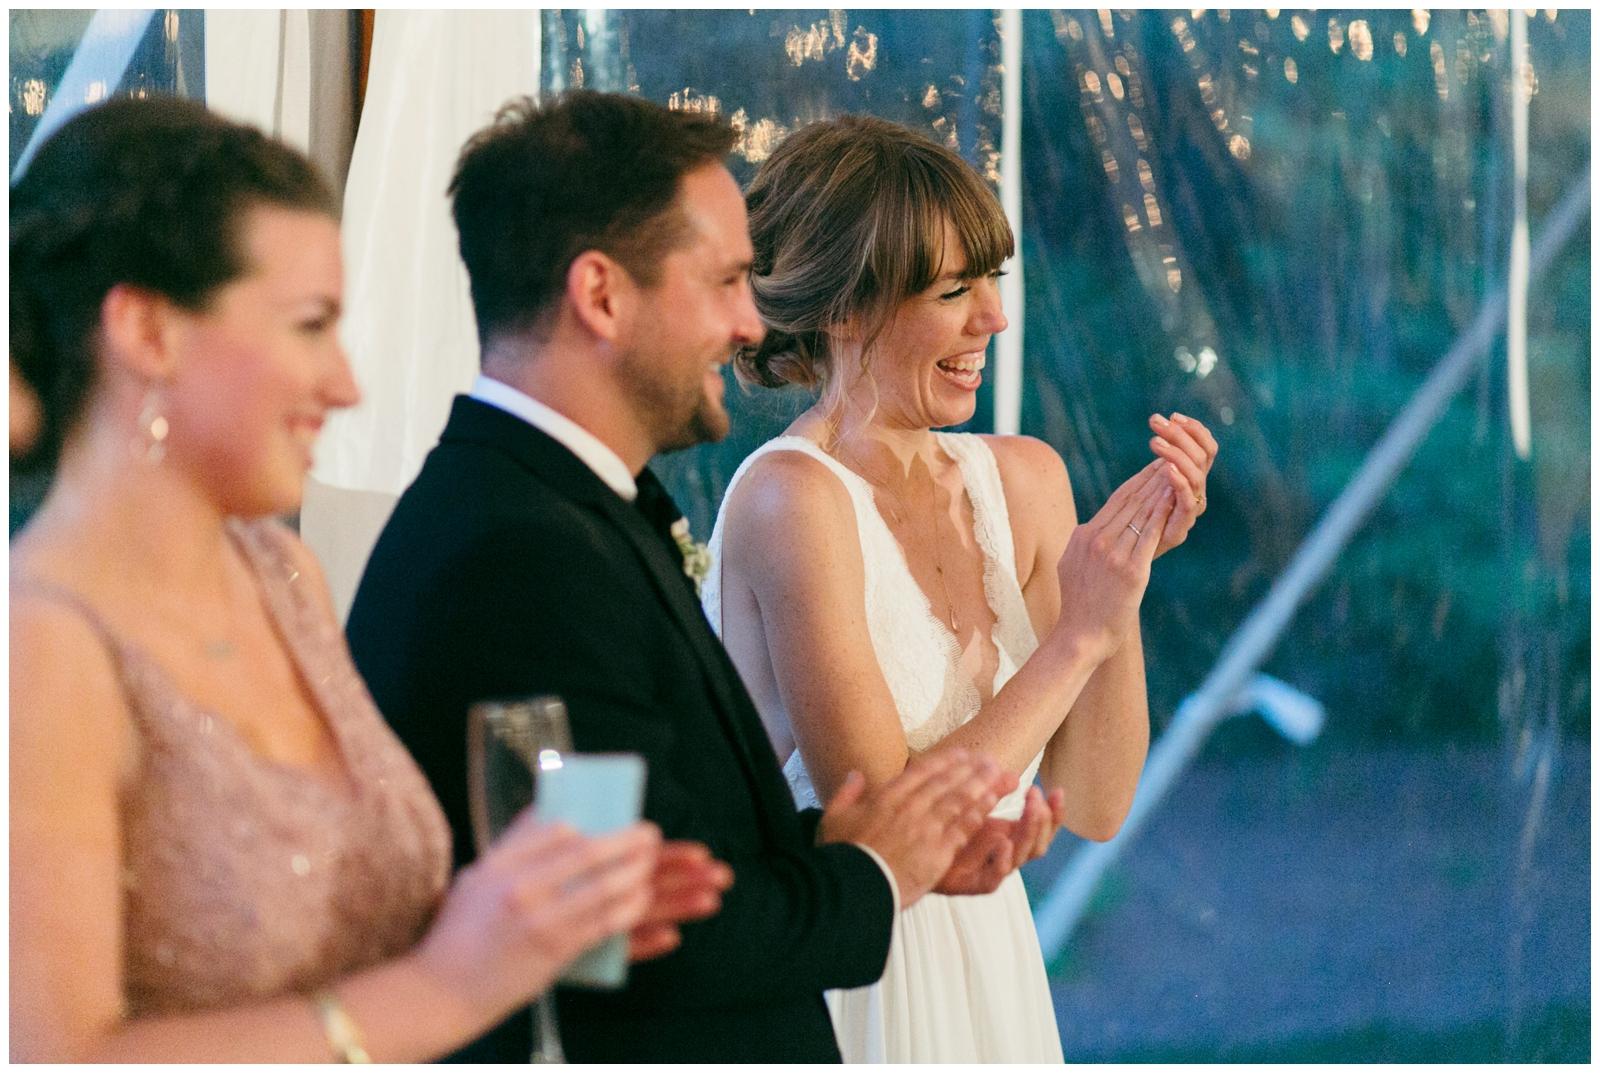 Moraine-Farm-wedding-Bailey-Q-Photo-Massachusetts-wedding-photpgrapher-140.jpg